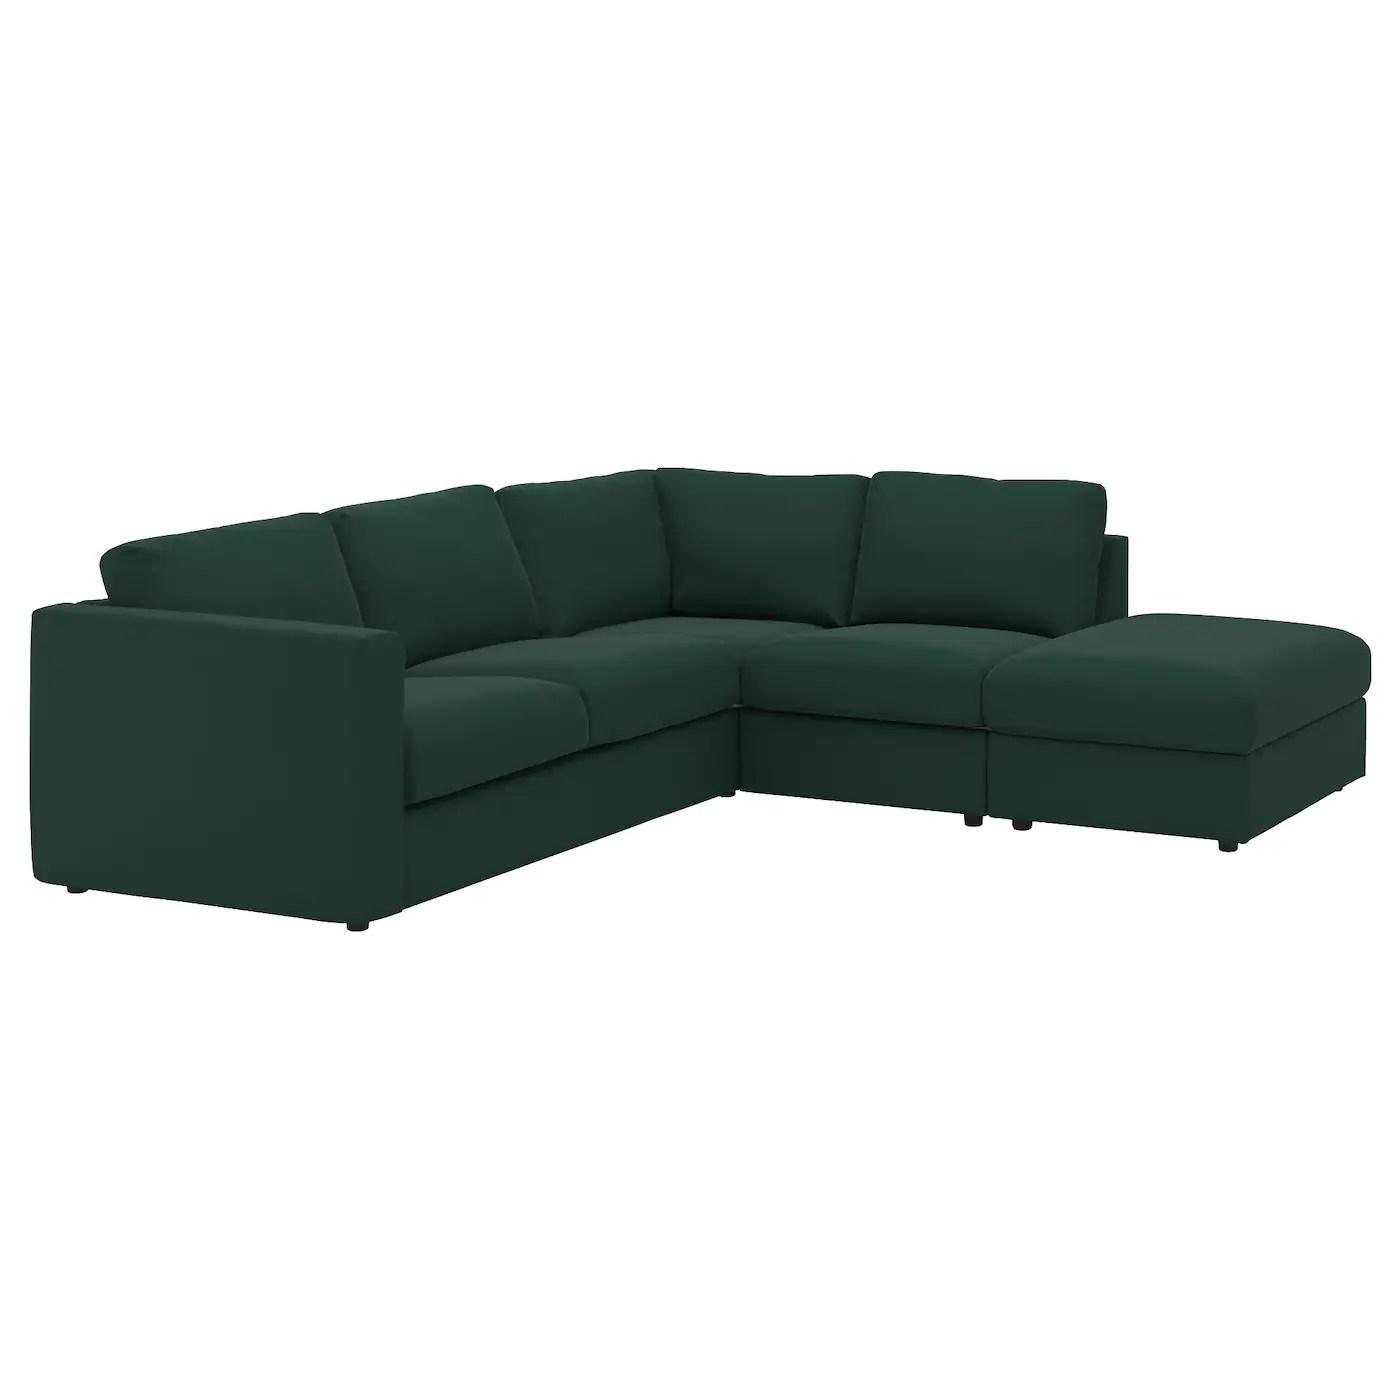 green leather corner sofa bed delaney sleeper modern in fareham